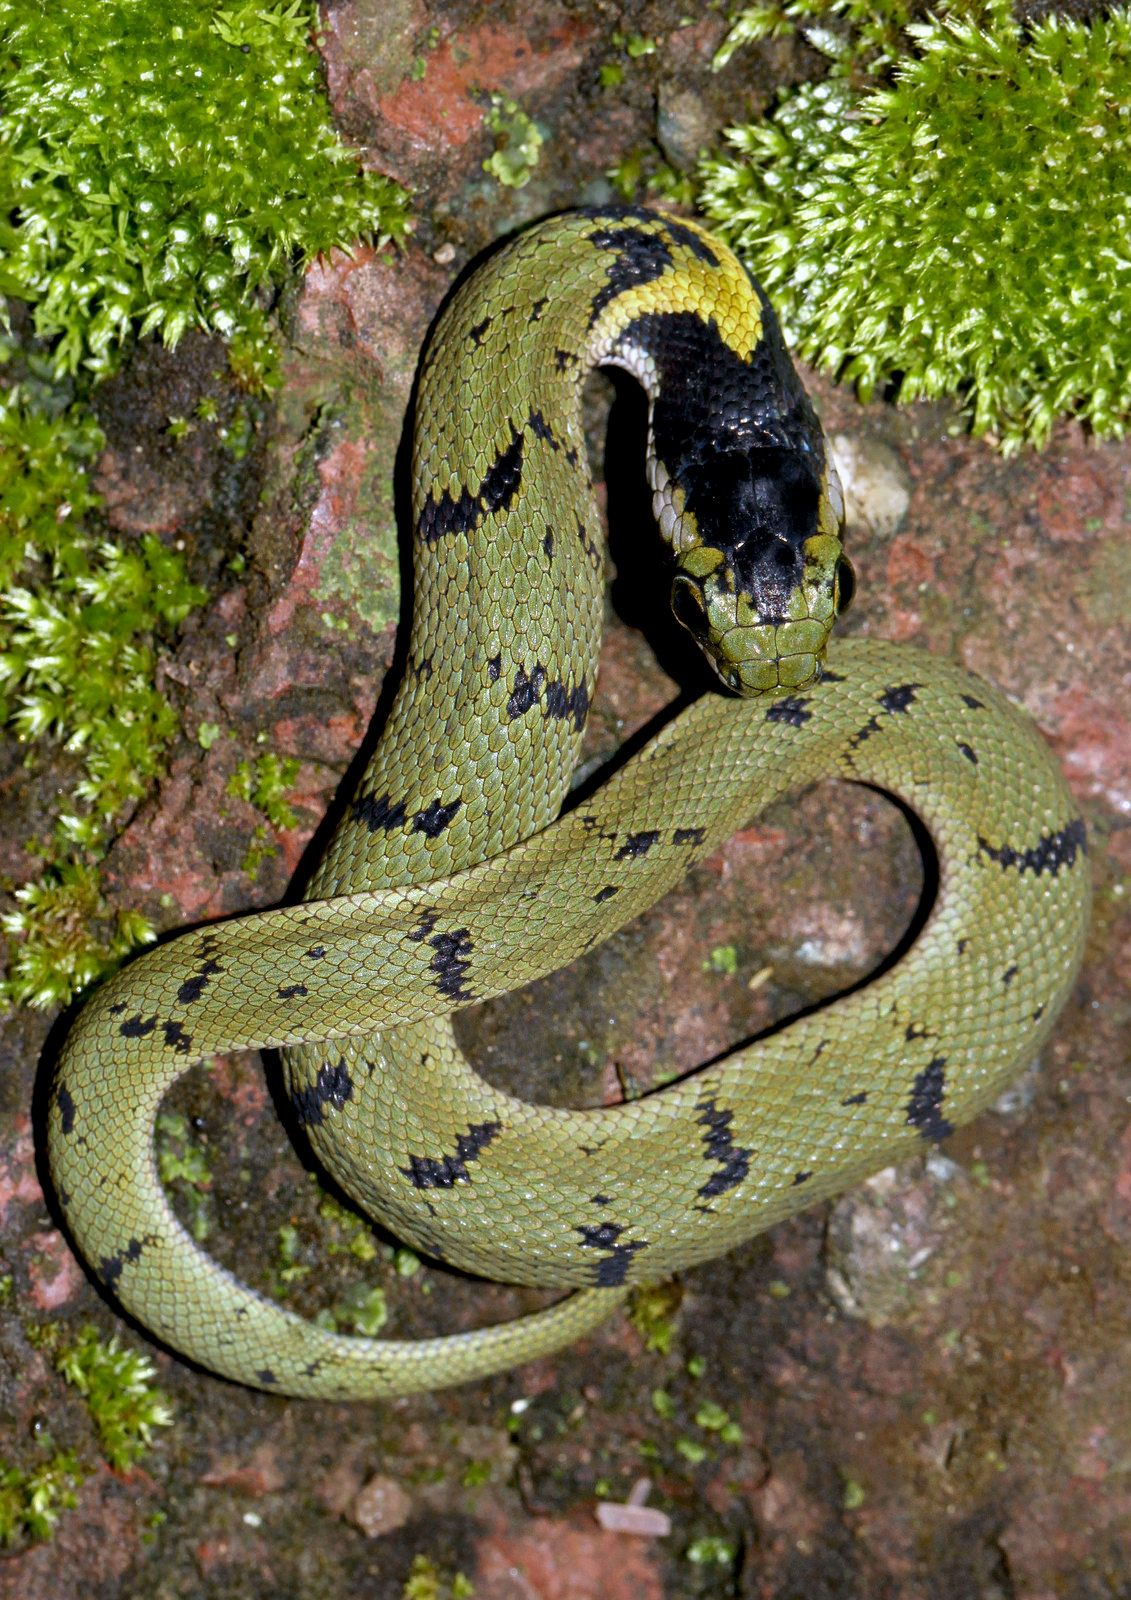 Green Keelback Macropisthodon Plumbicolor Reptiles And